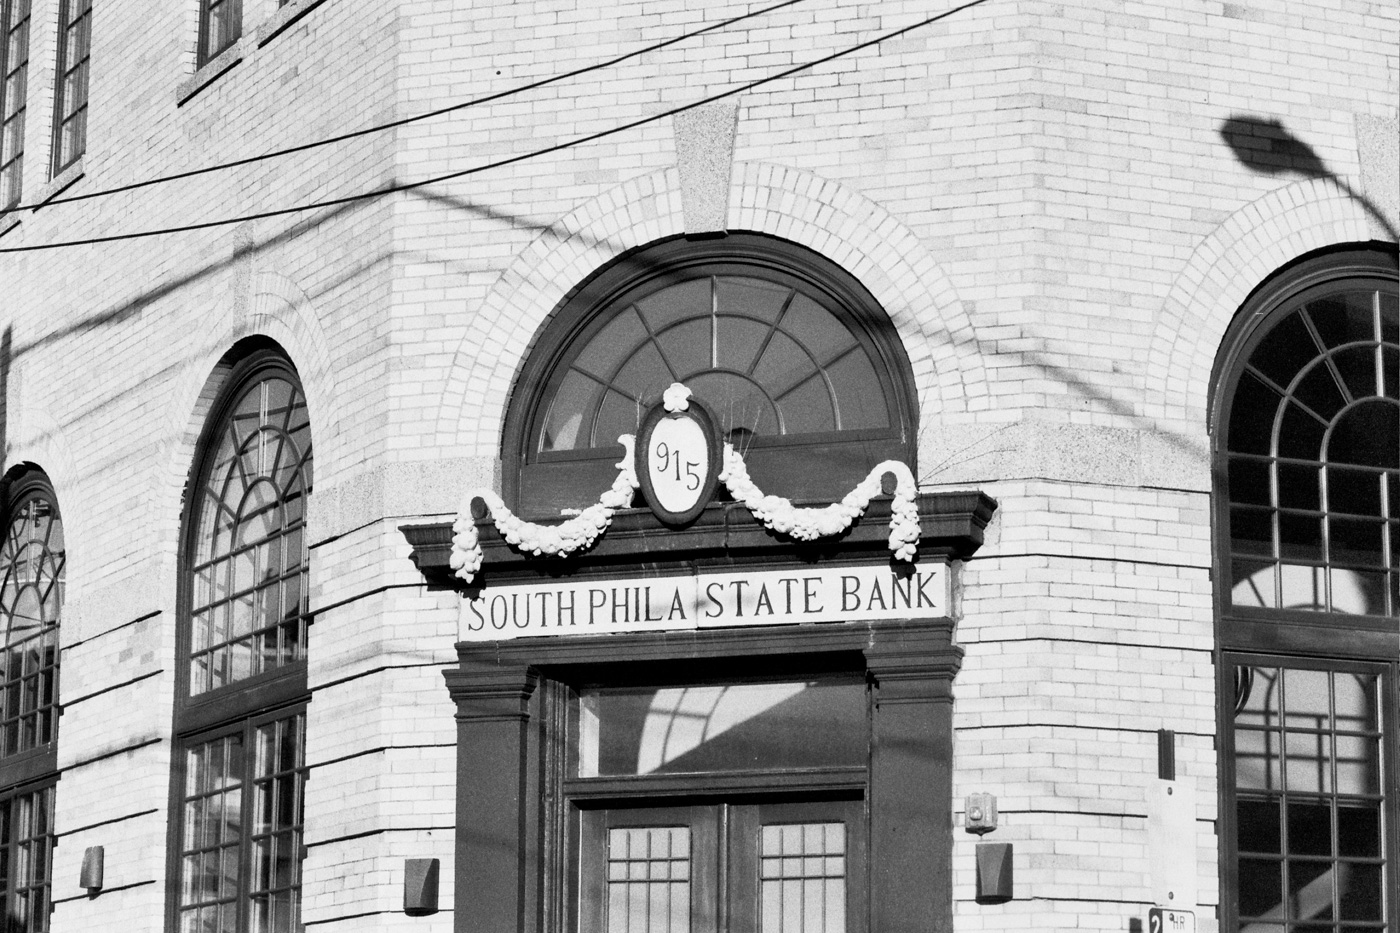 South Phila State Bank